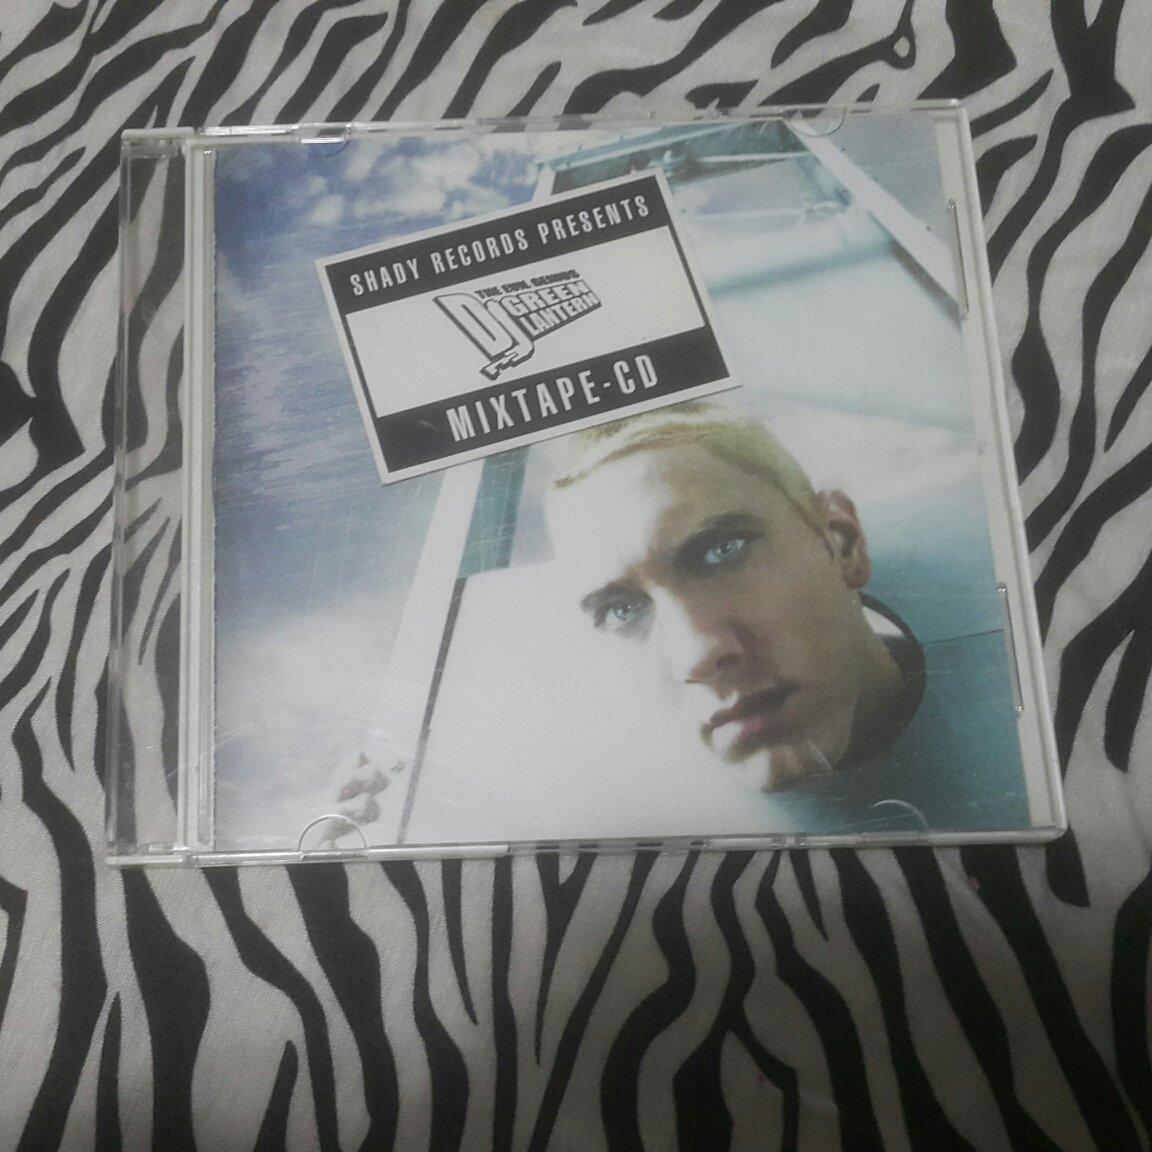 【音爆】 EMINEM  SHADY records presents  Mixtape CD 宣傳片 阿姆